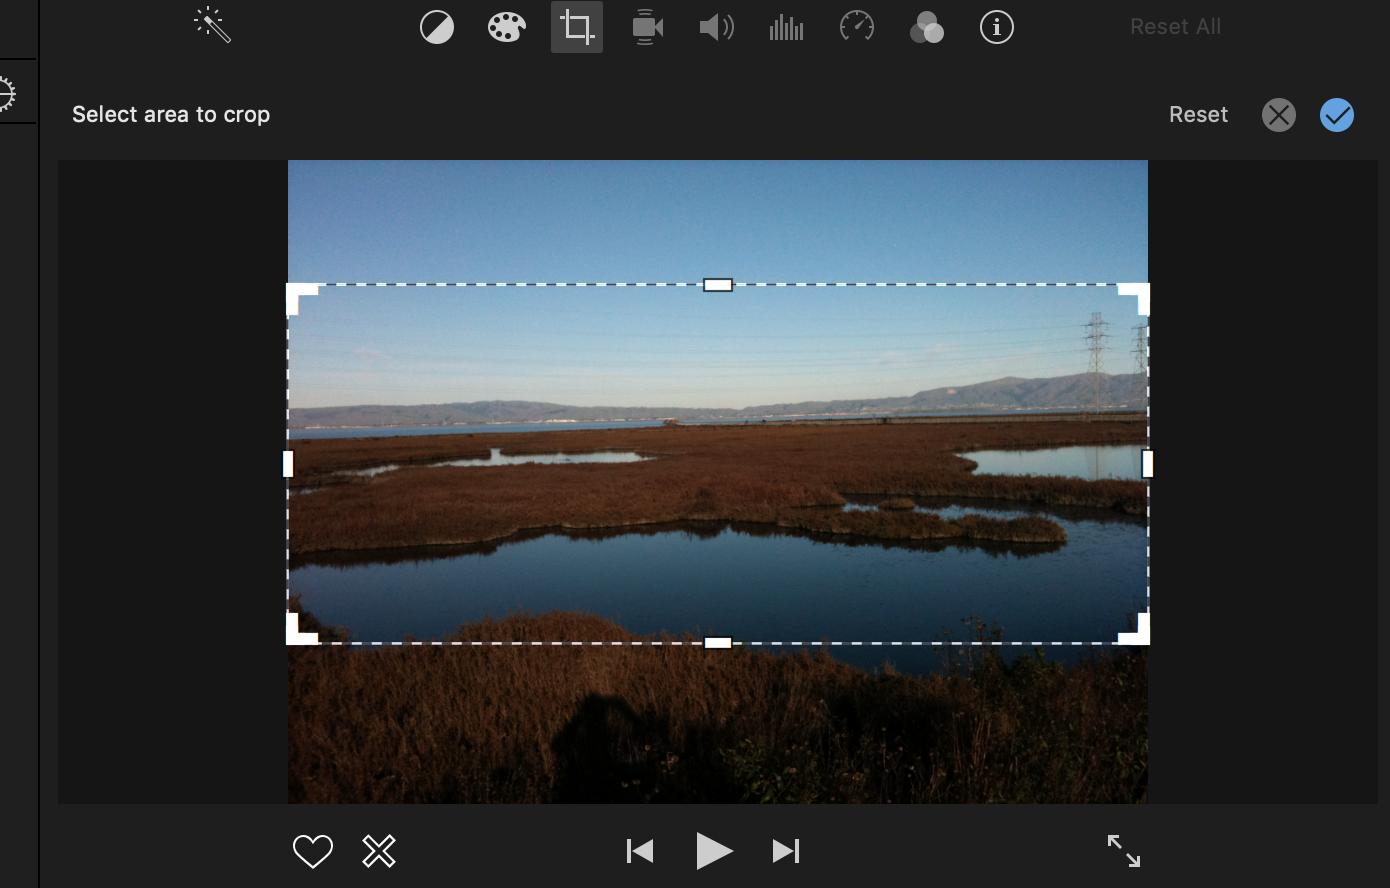 How to change aspect ratio in IMovie? - Apple Community